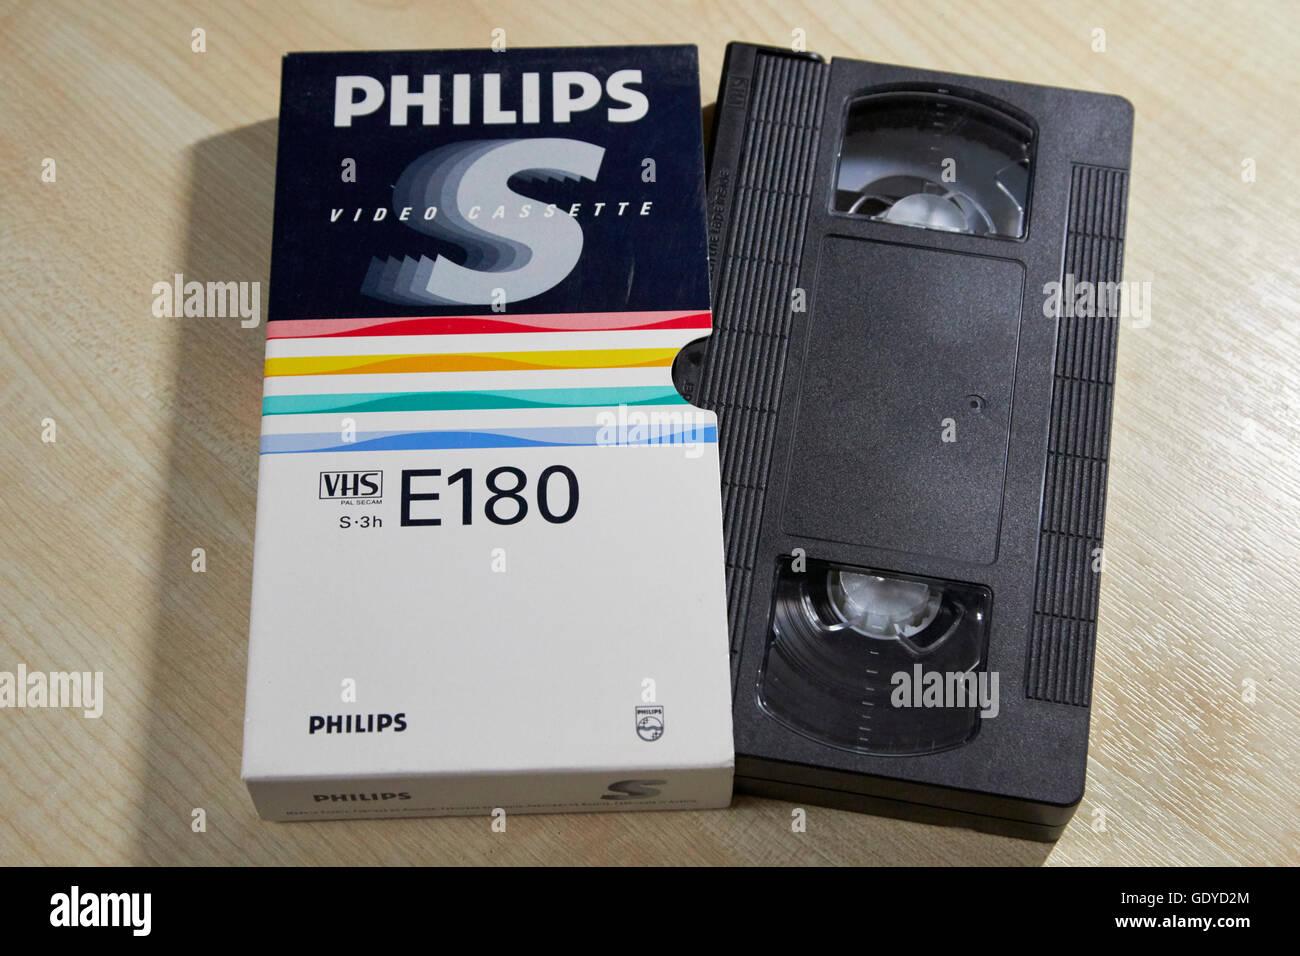 philips e180 video VHS blank cassette tapes - Stock Image